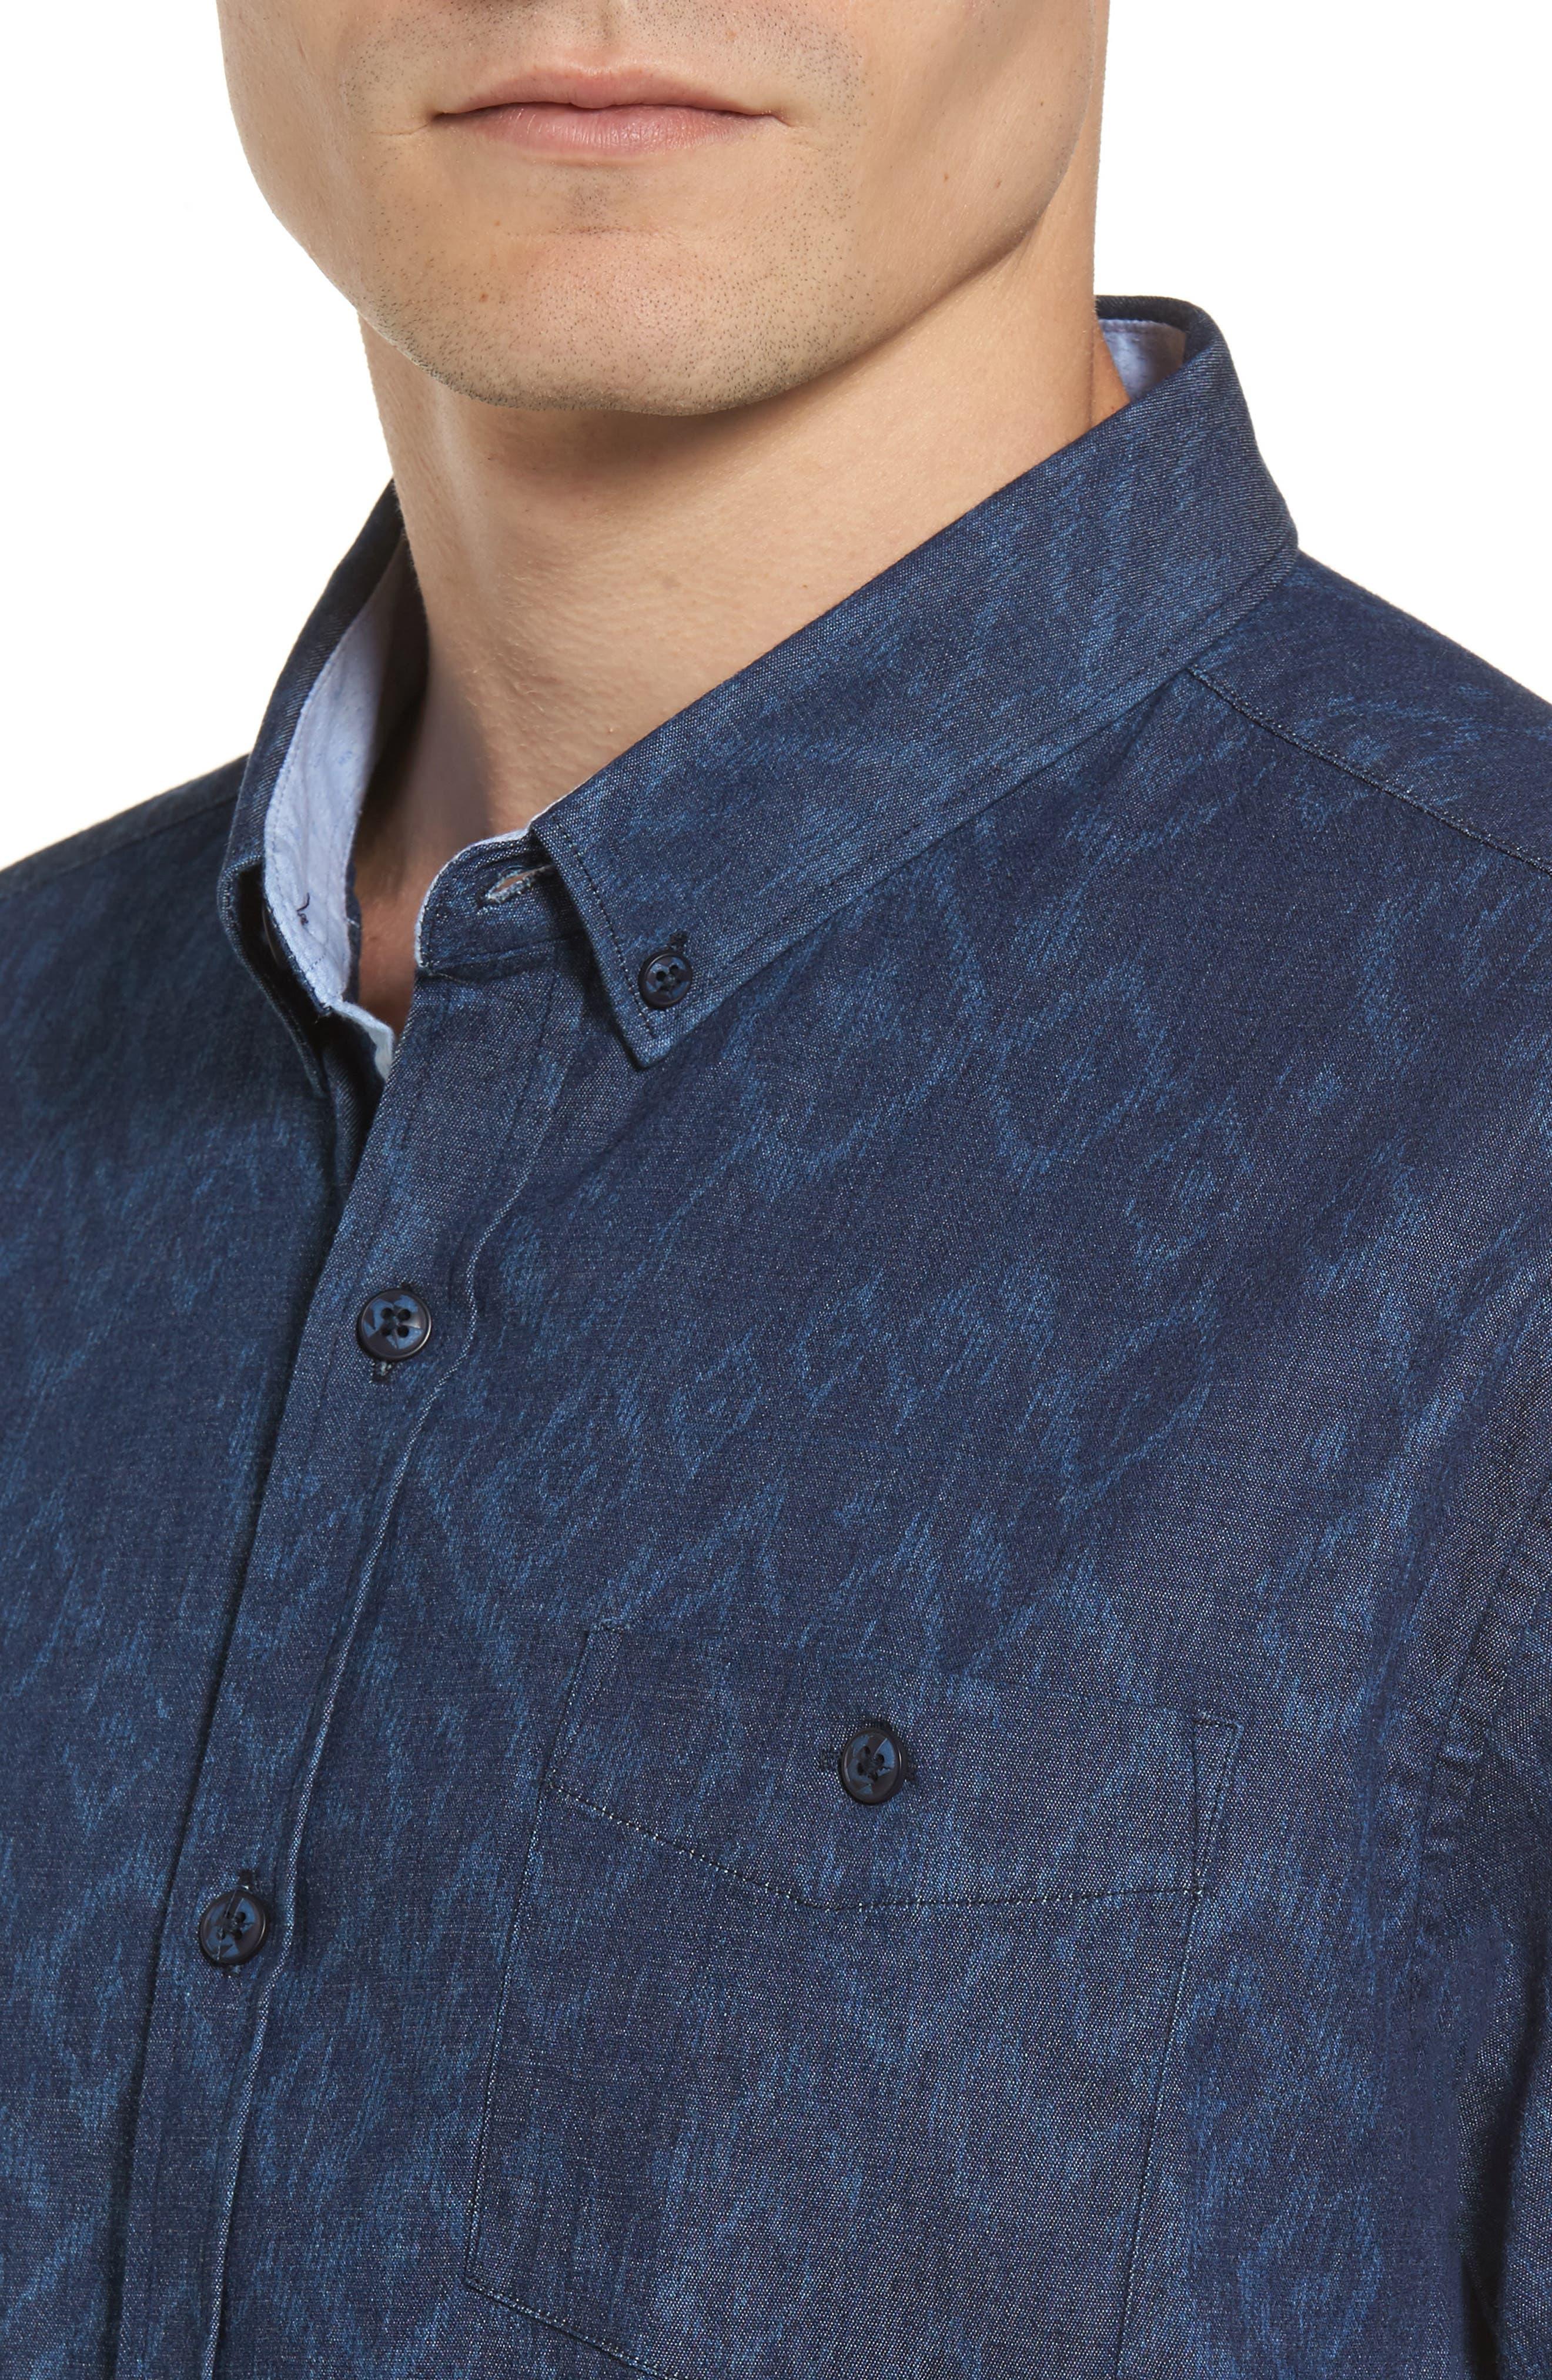 Marquee Moon Print Woven Shirt,                             Alternate thumbnail 4, color,                             410